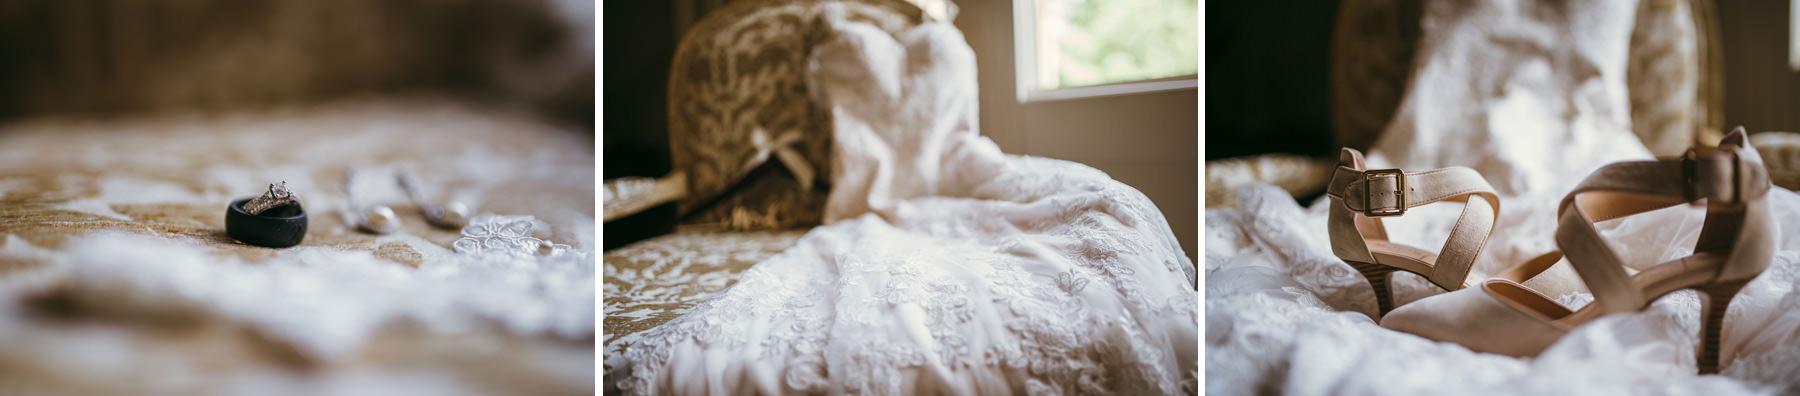 Kansas City Summer Wedding at the Guild_Kindling Wedding Photography Blog14.JPG